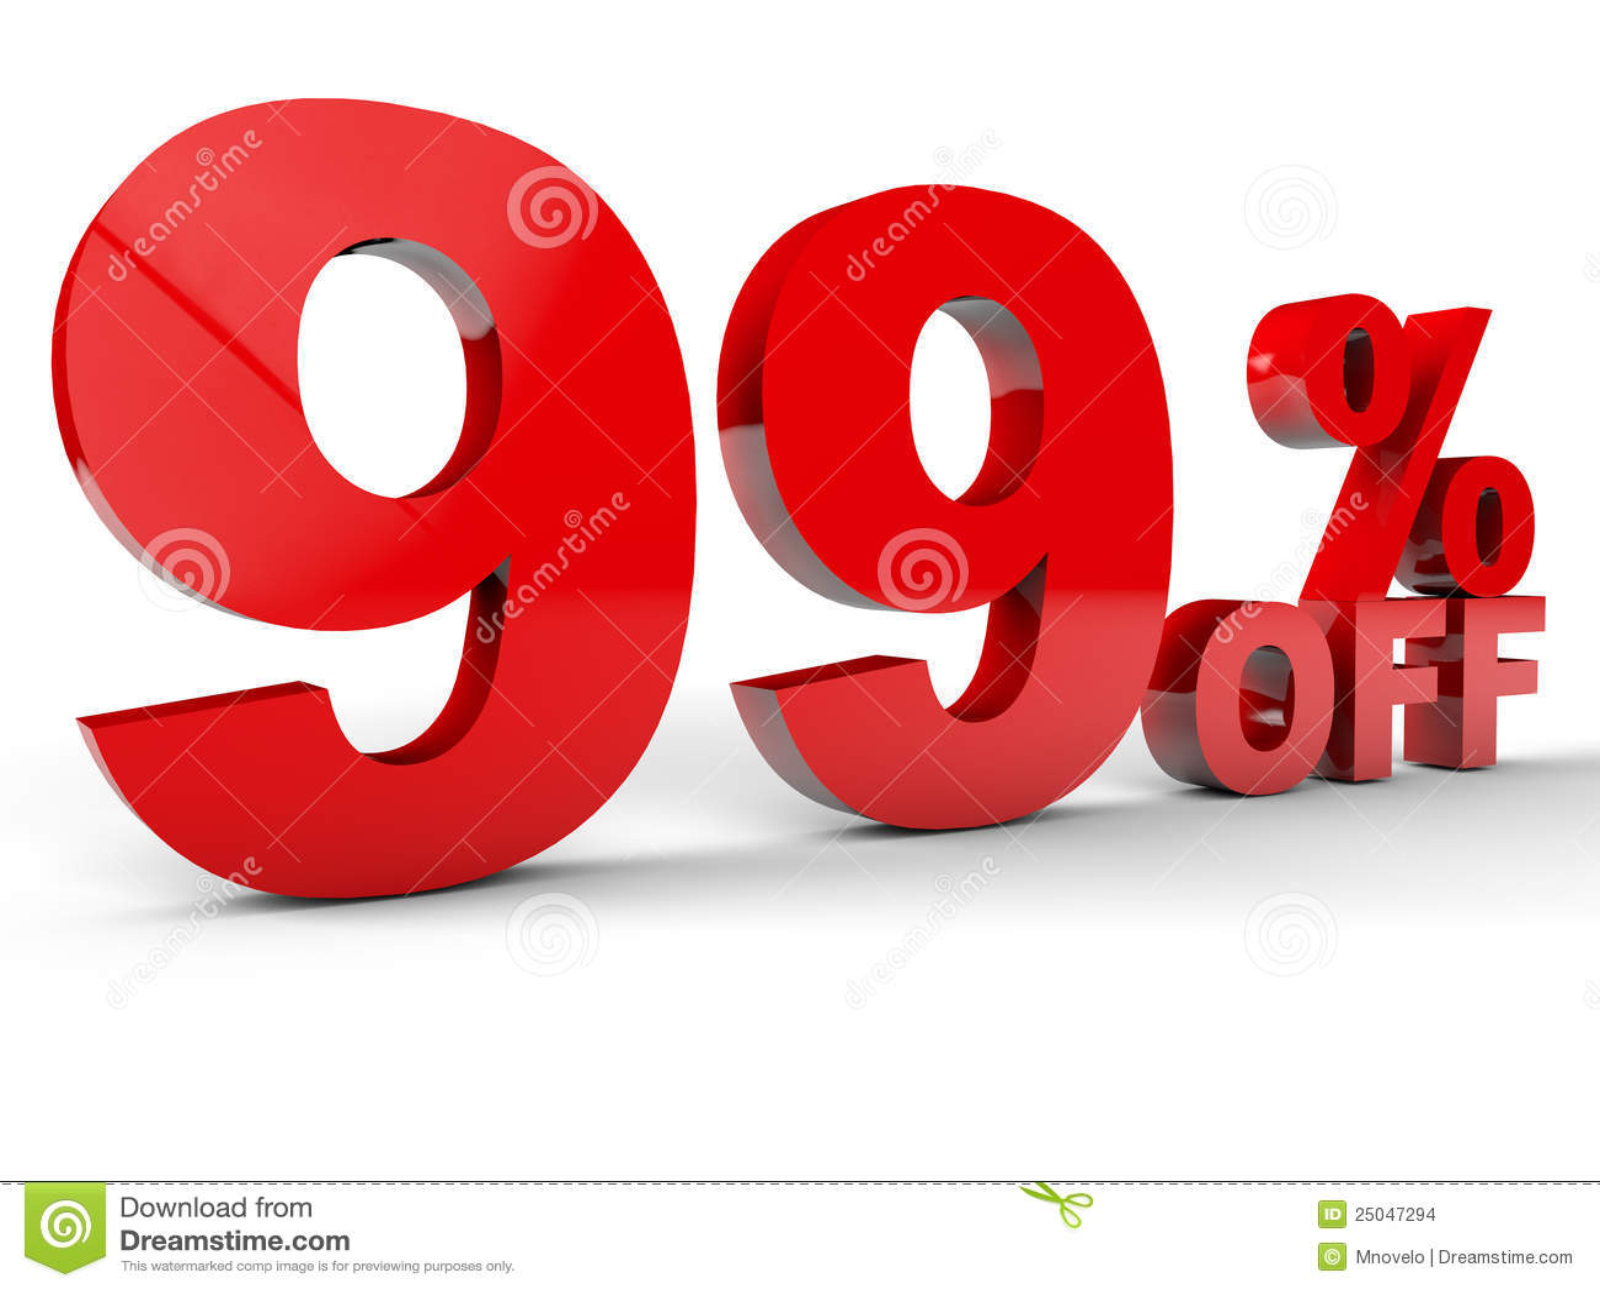 99 Percent off stock illustration. Illustration of advertising ...